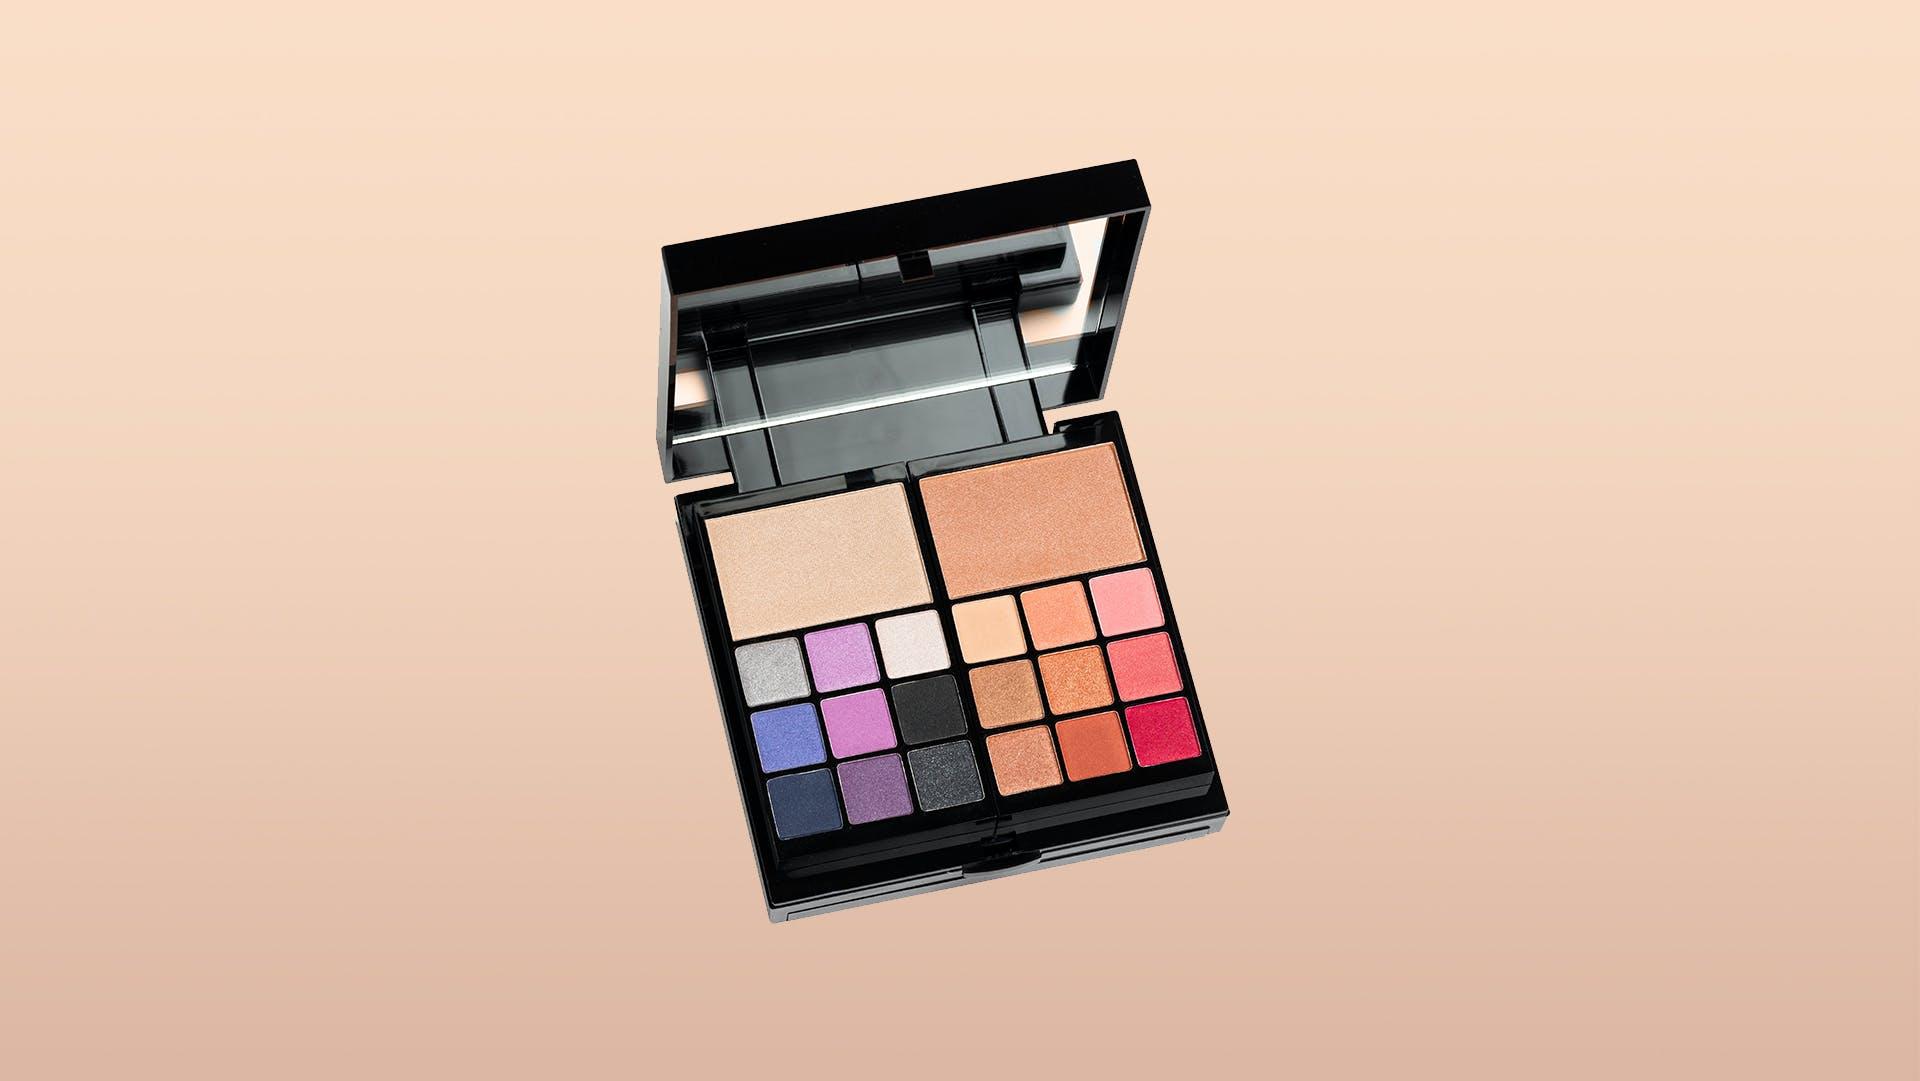 packshot cosmetica, packshot e-commerce, packshot product, packshot prijs, packshot tarief